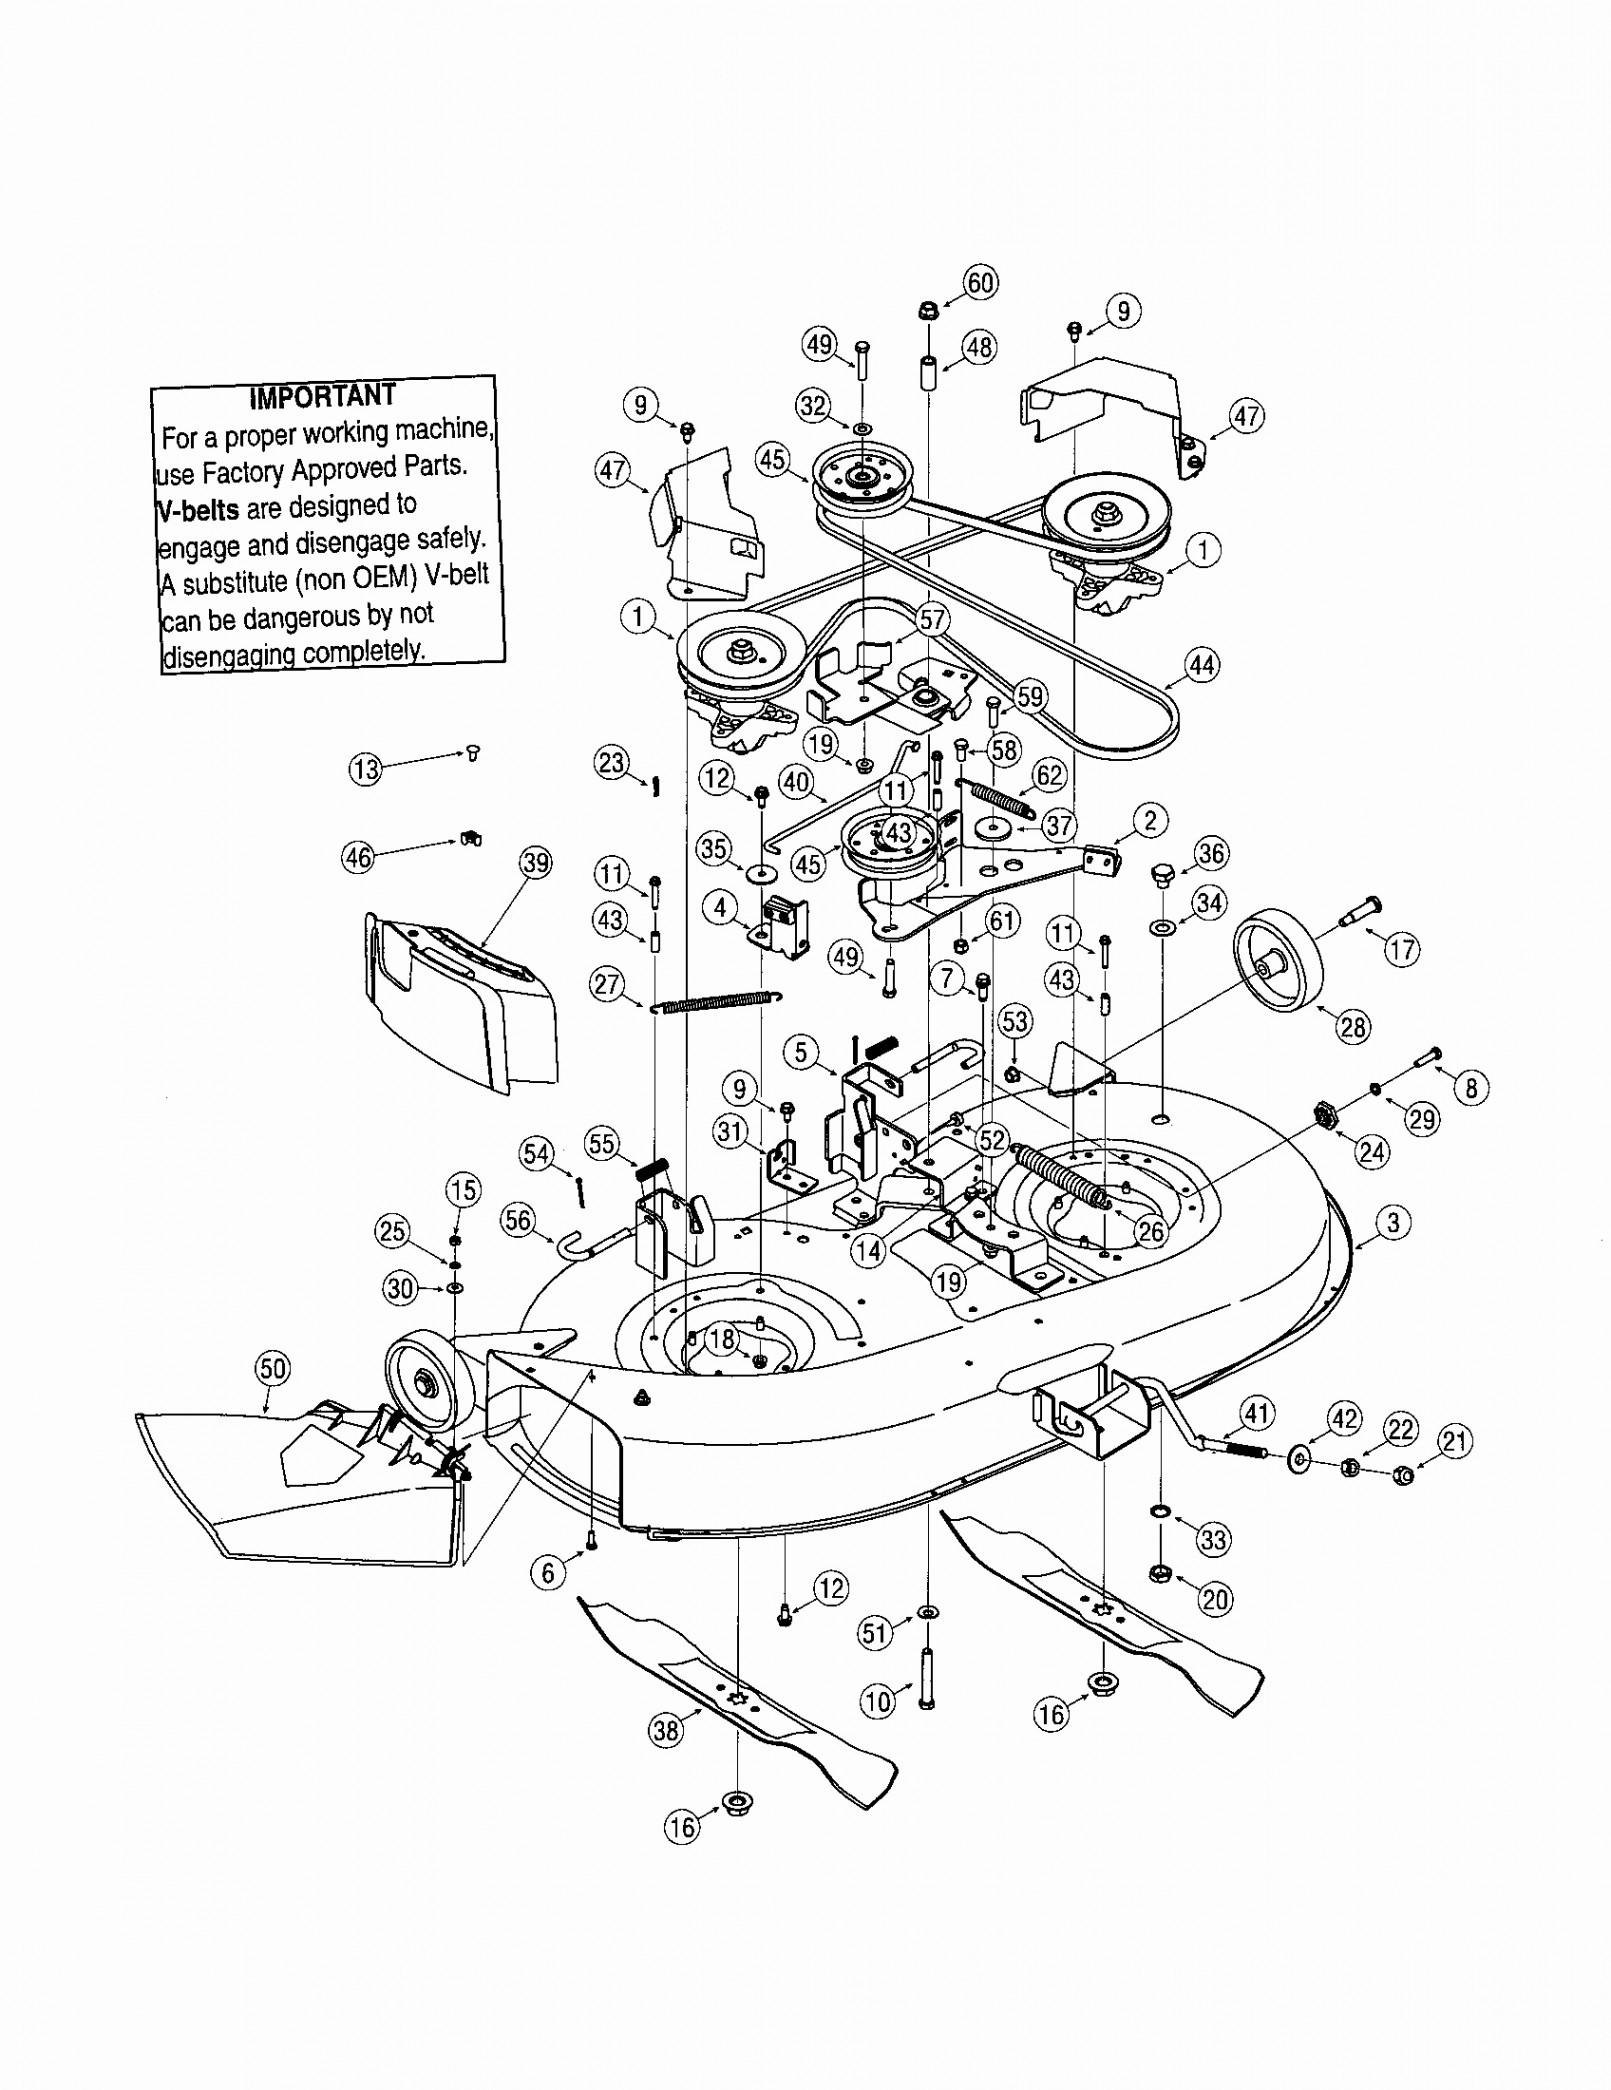 Wiring Database 2020: 26 Troy Bilt Drive Belt Diagram